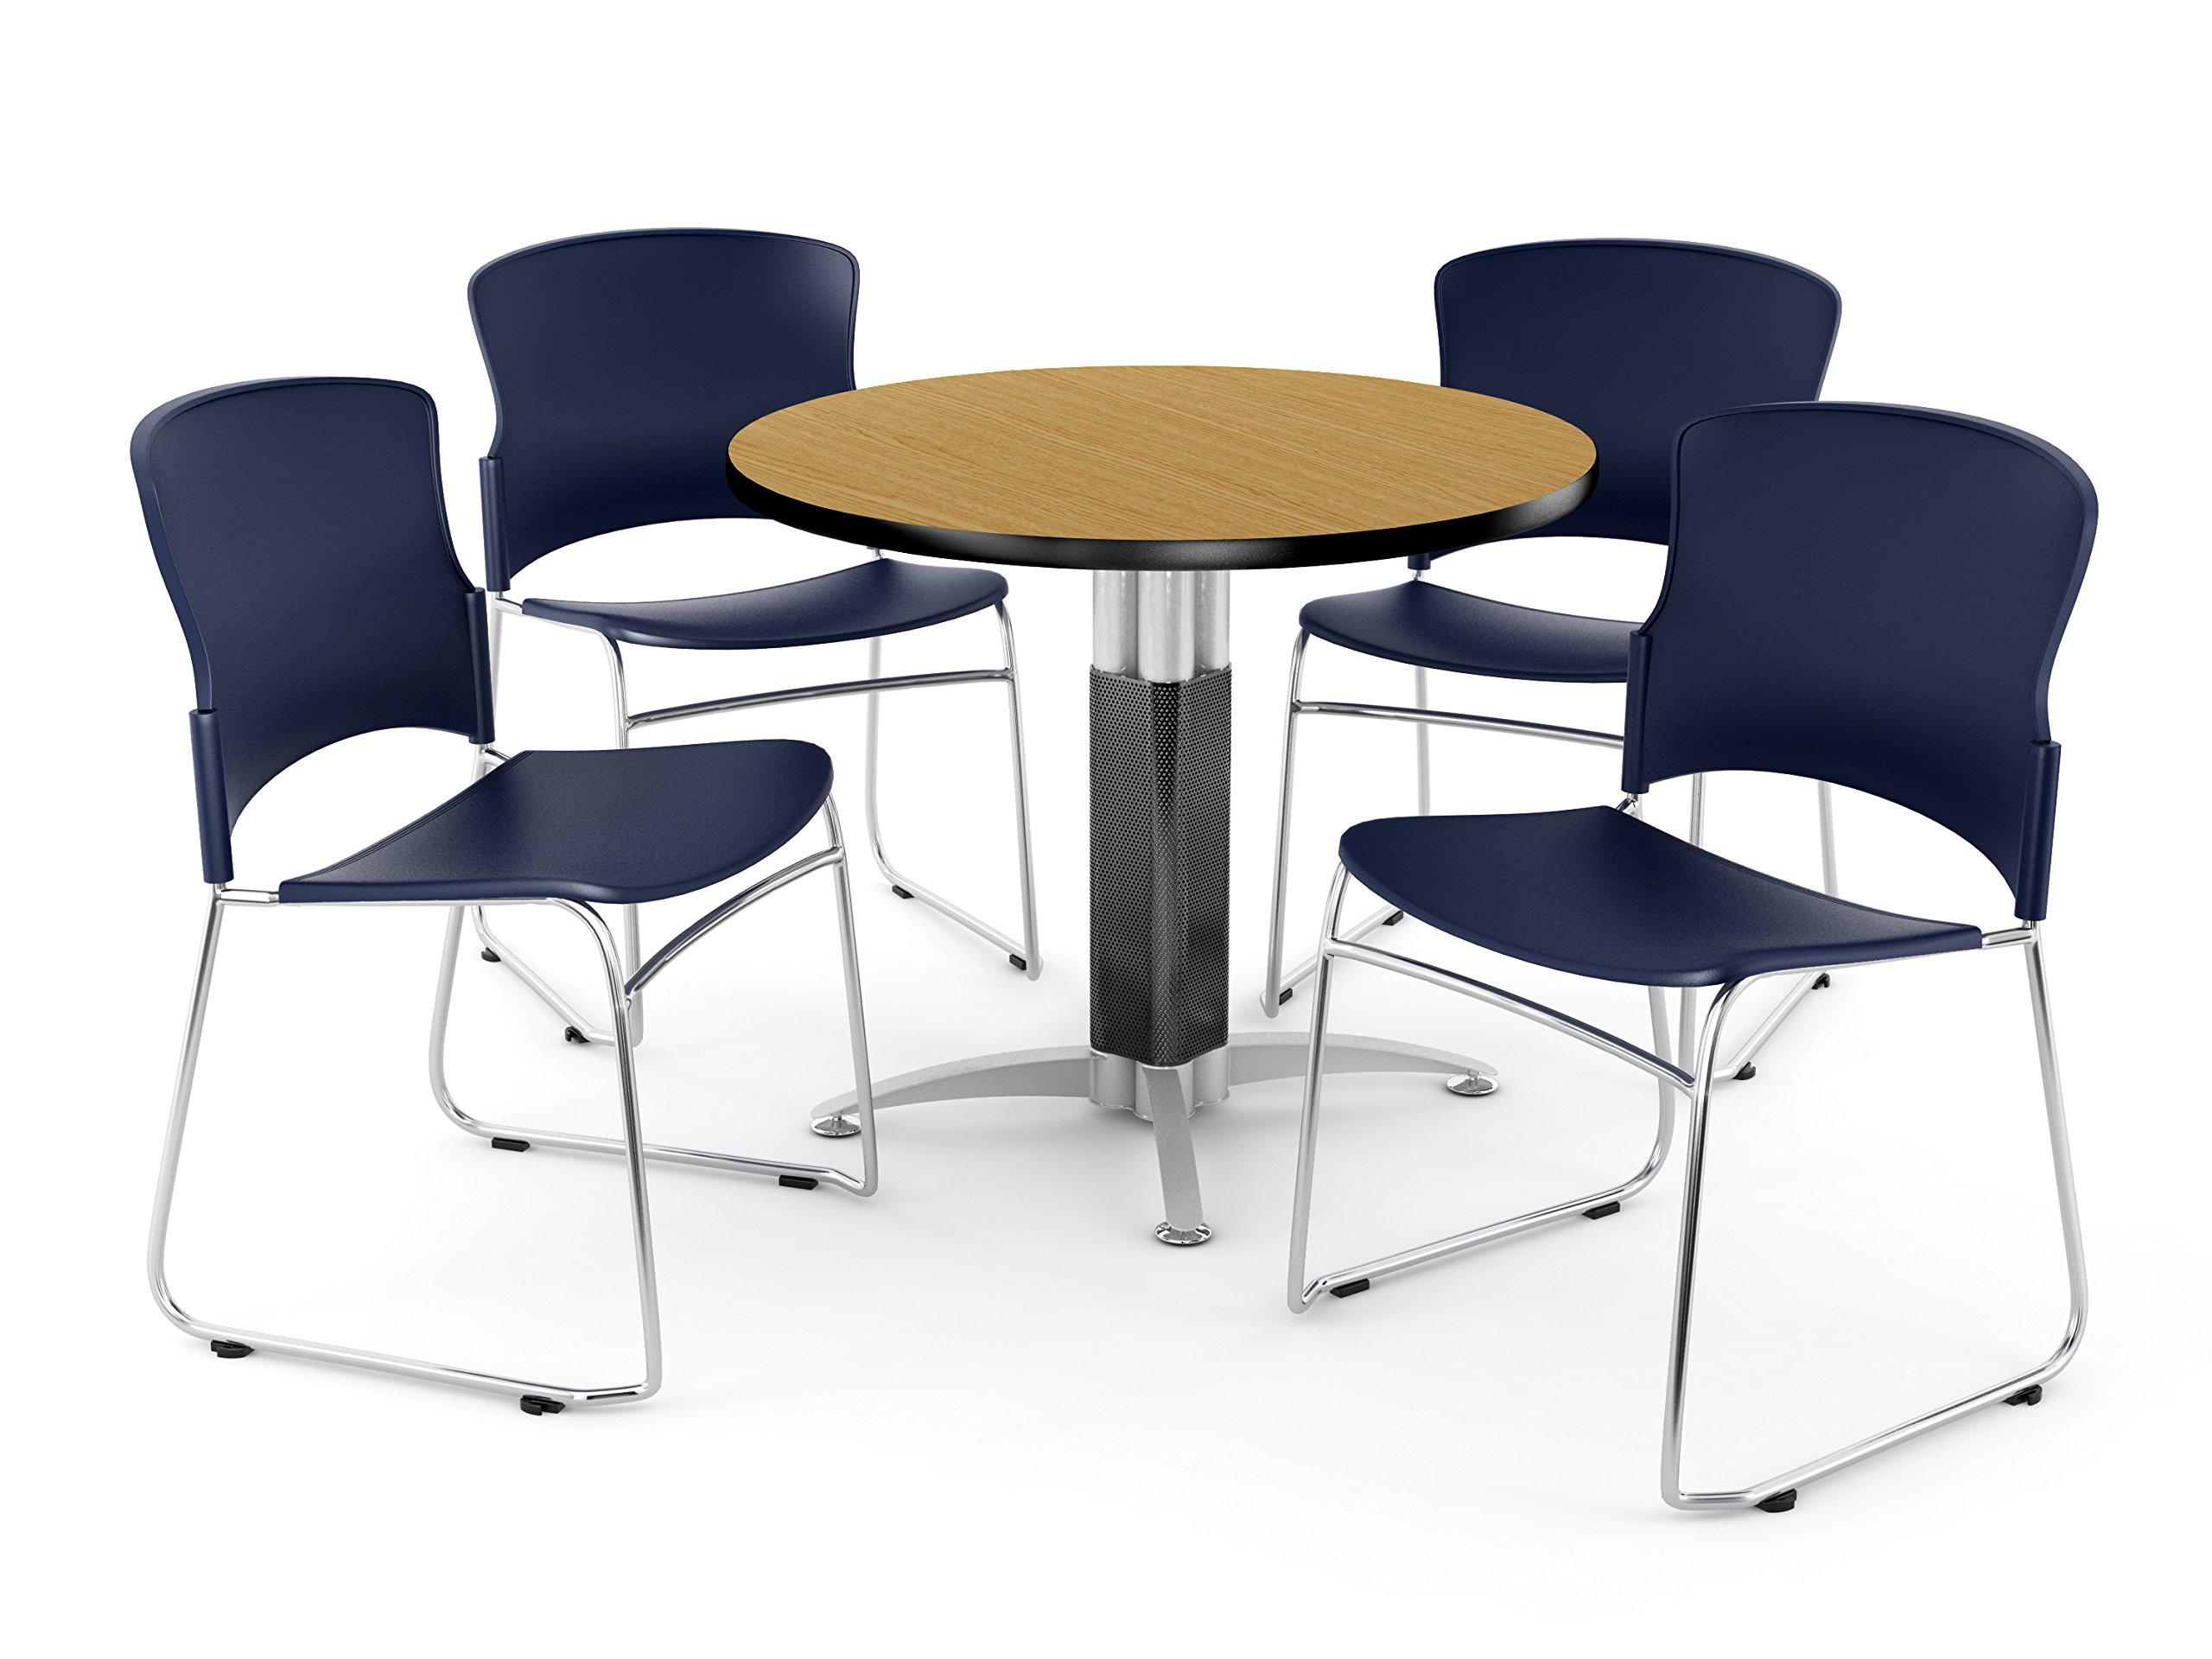 OFM PKG-BRK-027-0016 Breakroom Package, Oak Table/Navy Chair